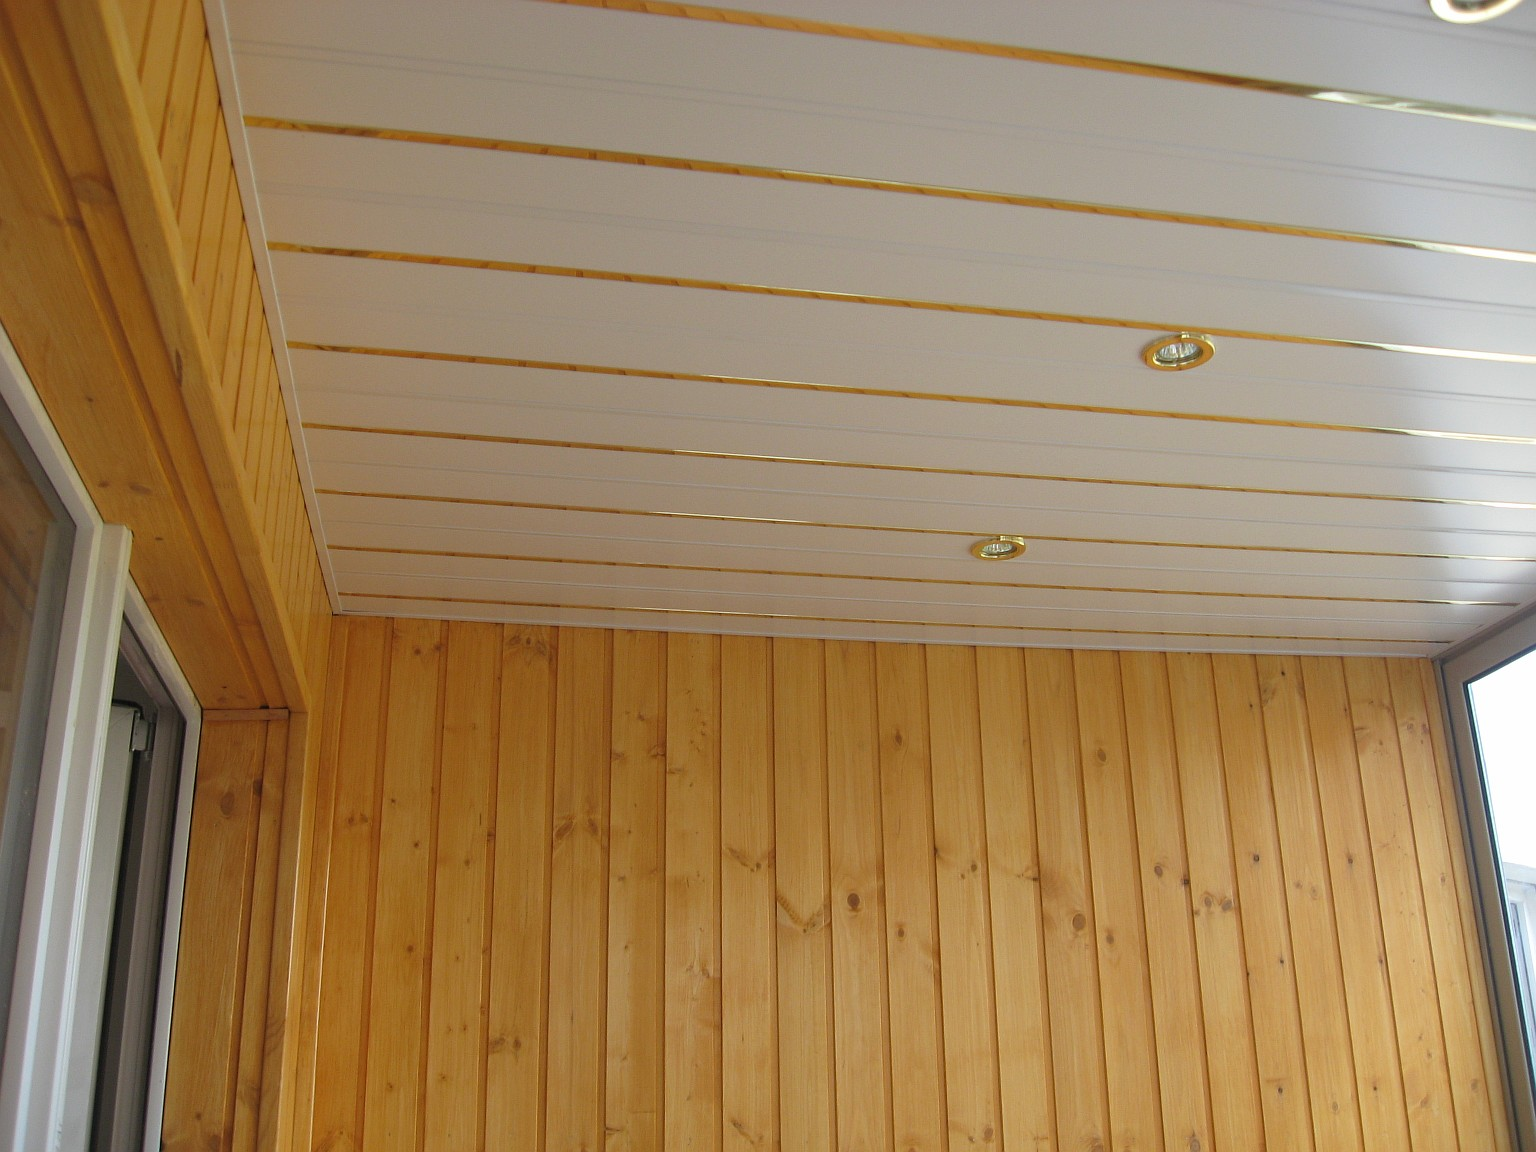 Фото: утепление и обшивка балконов. проектування, монтаж схо.